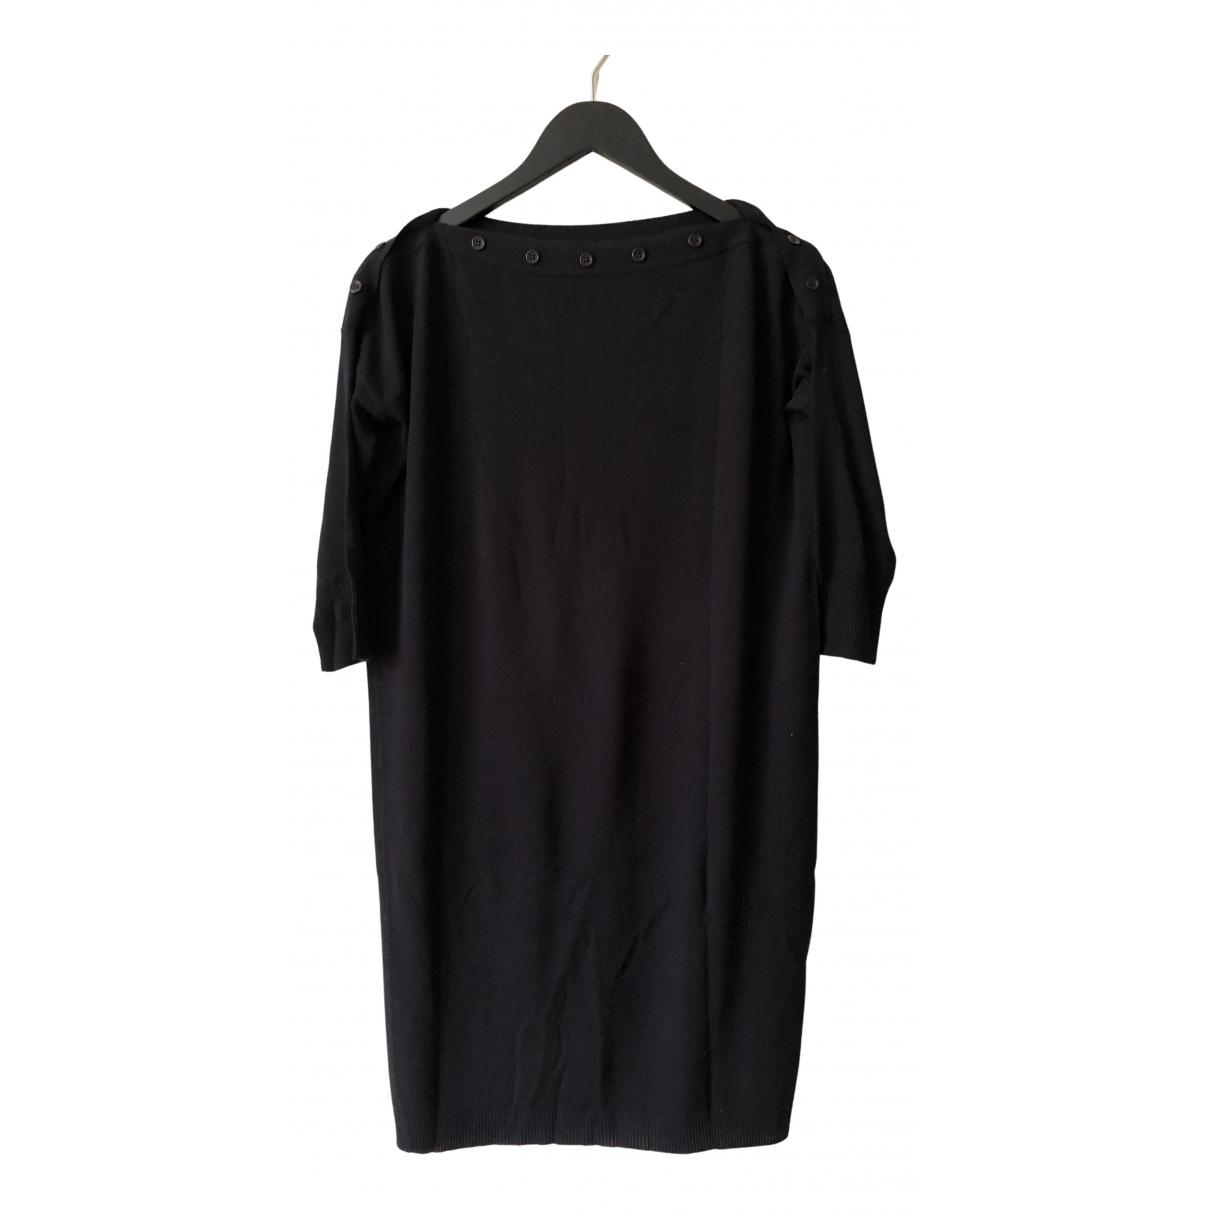 Balenciaga N Black dress for Women 38 FR